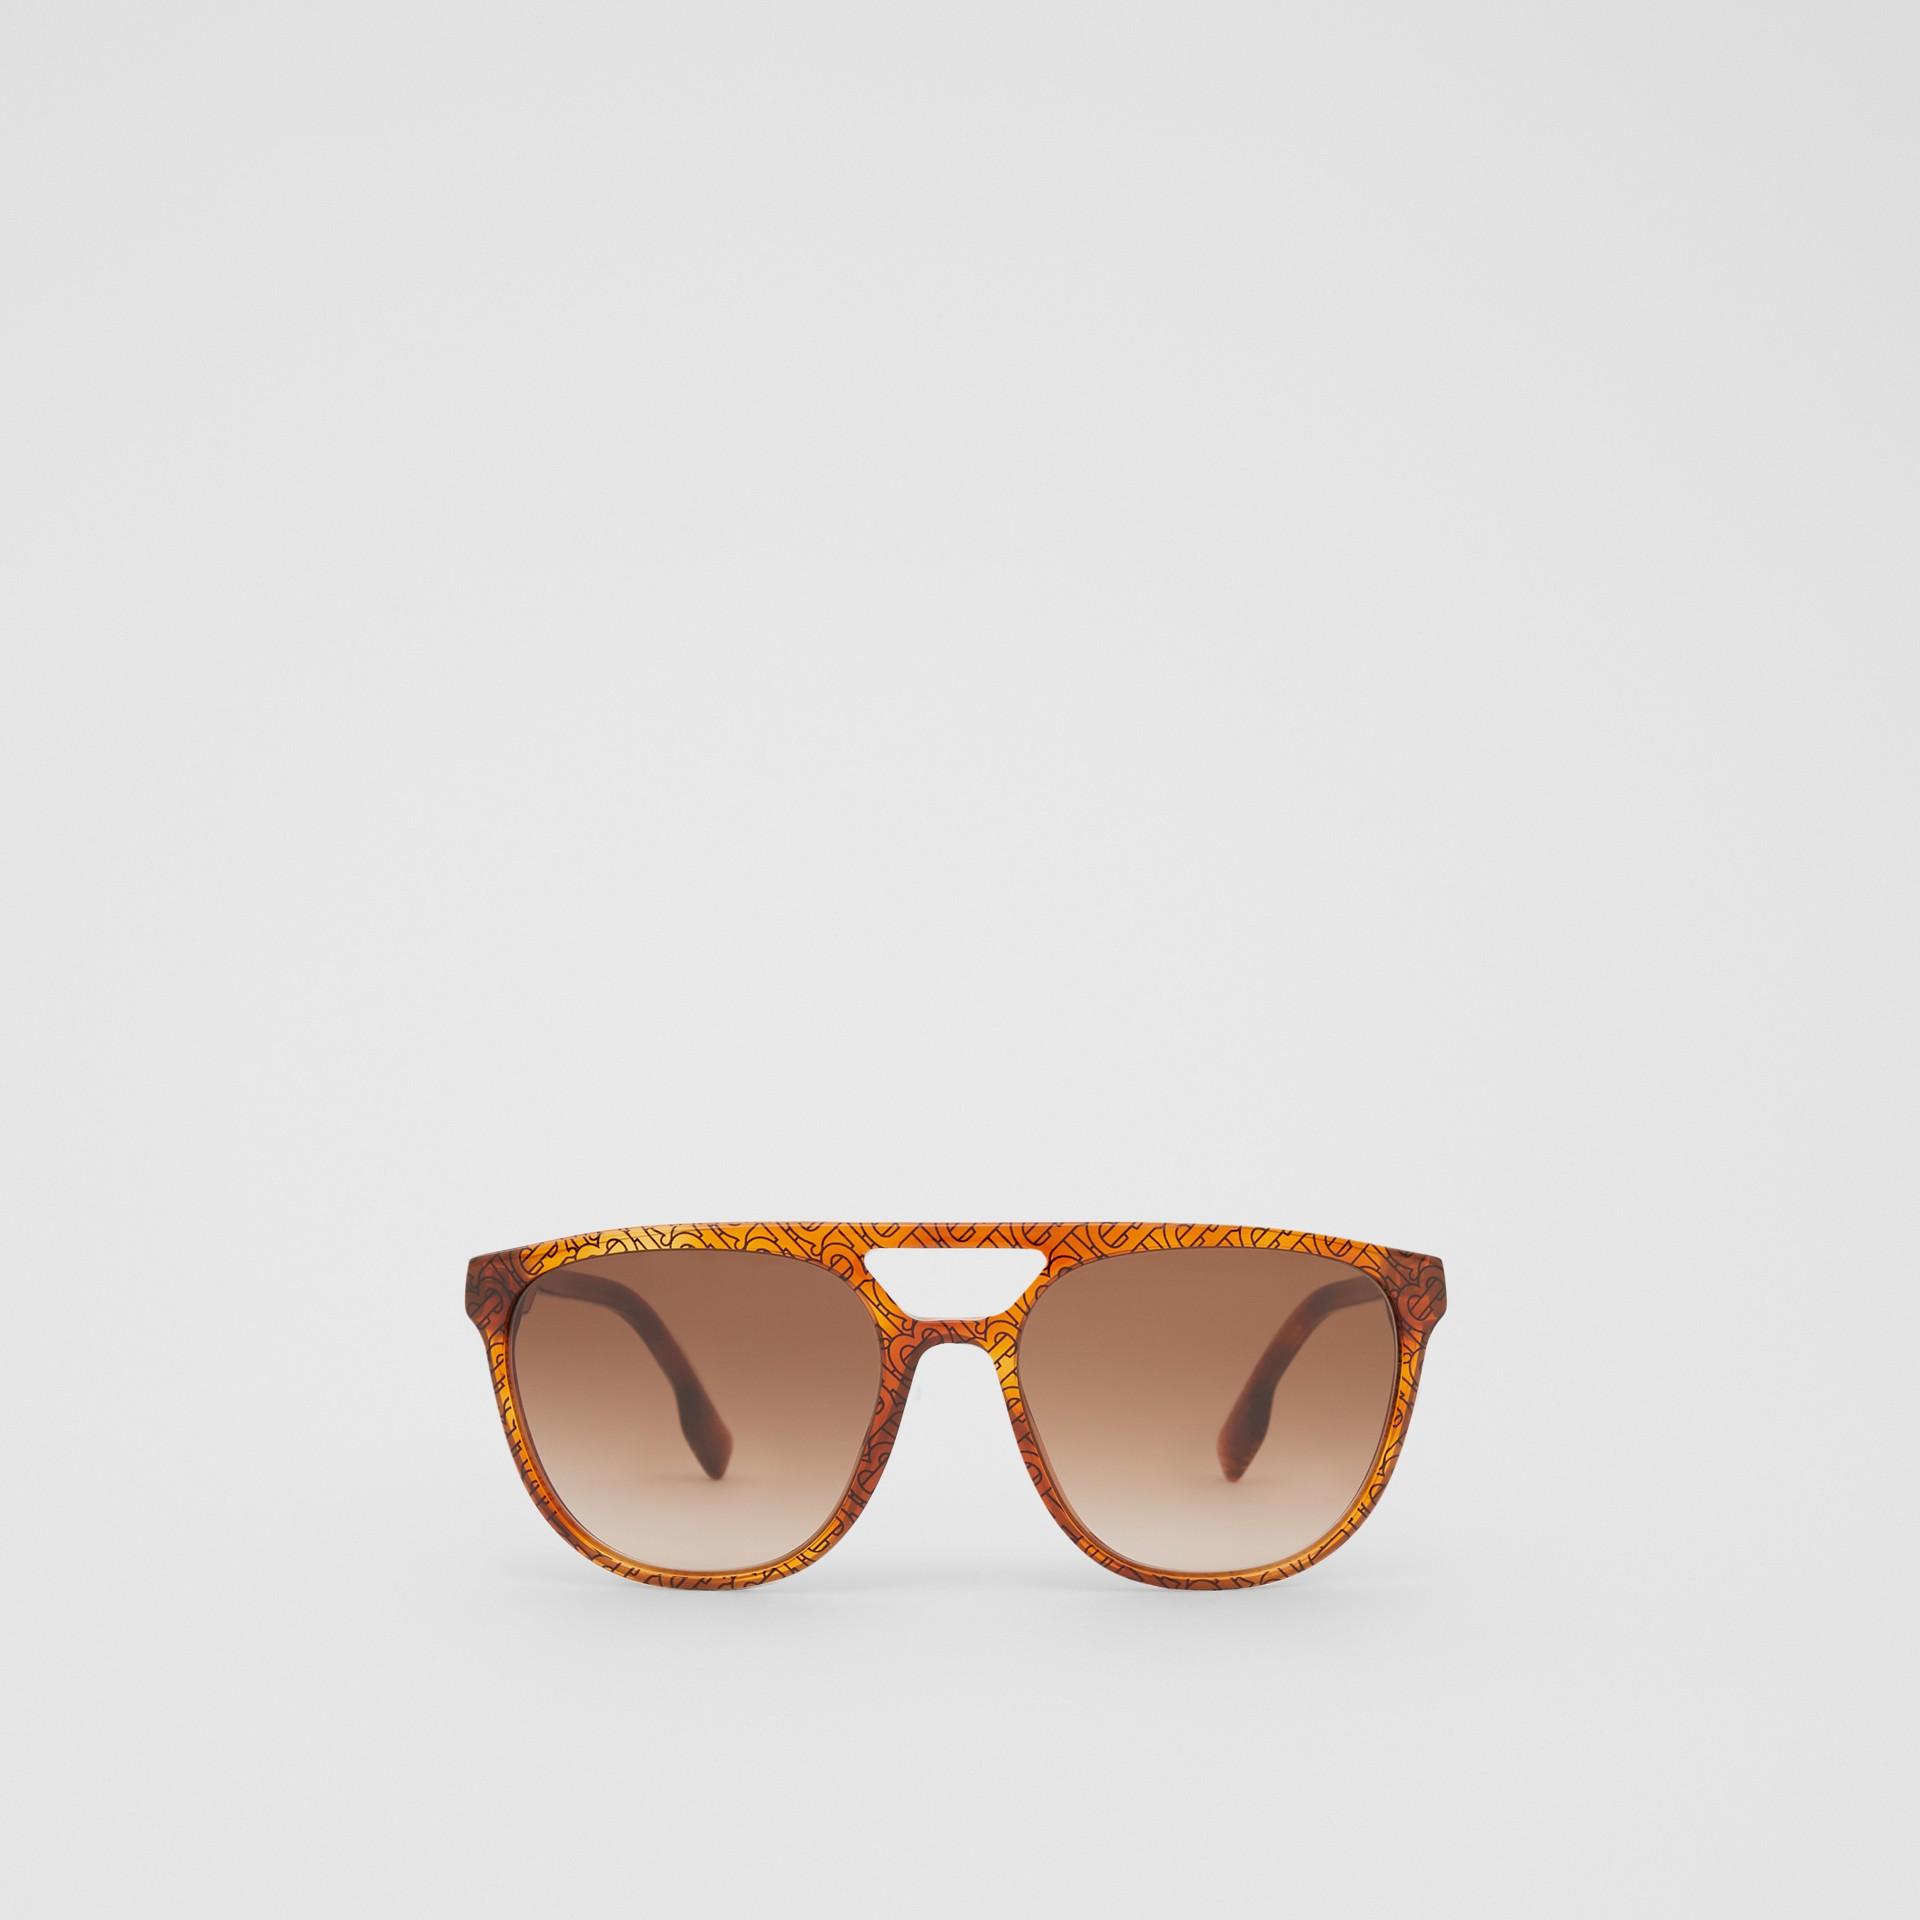 Navigator Sunglasses in Tortoiseshell Amber - Men | Burberry - gallery image 0